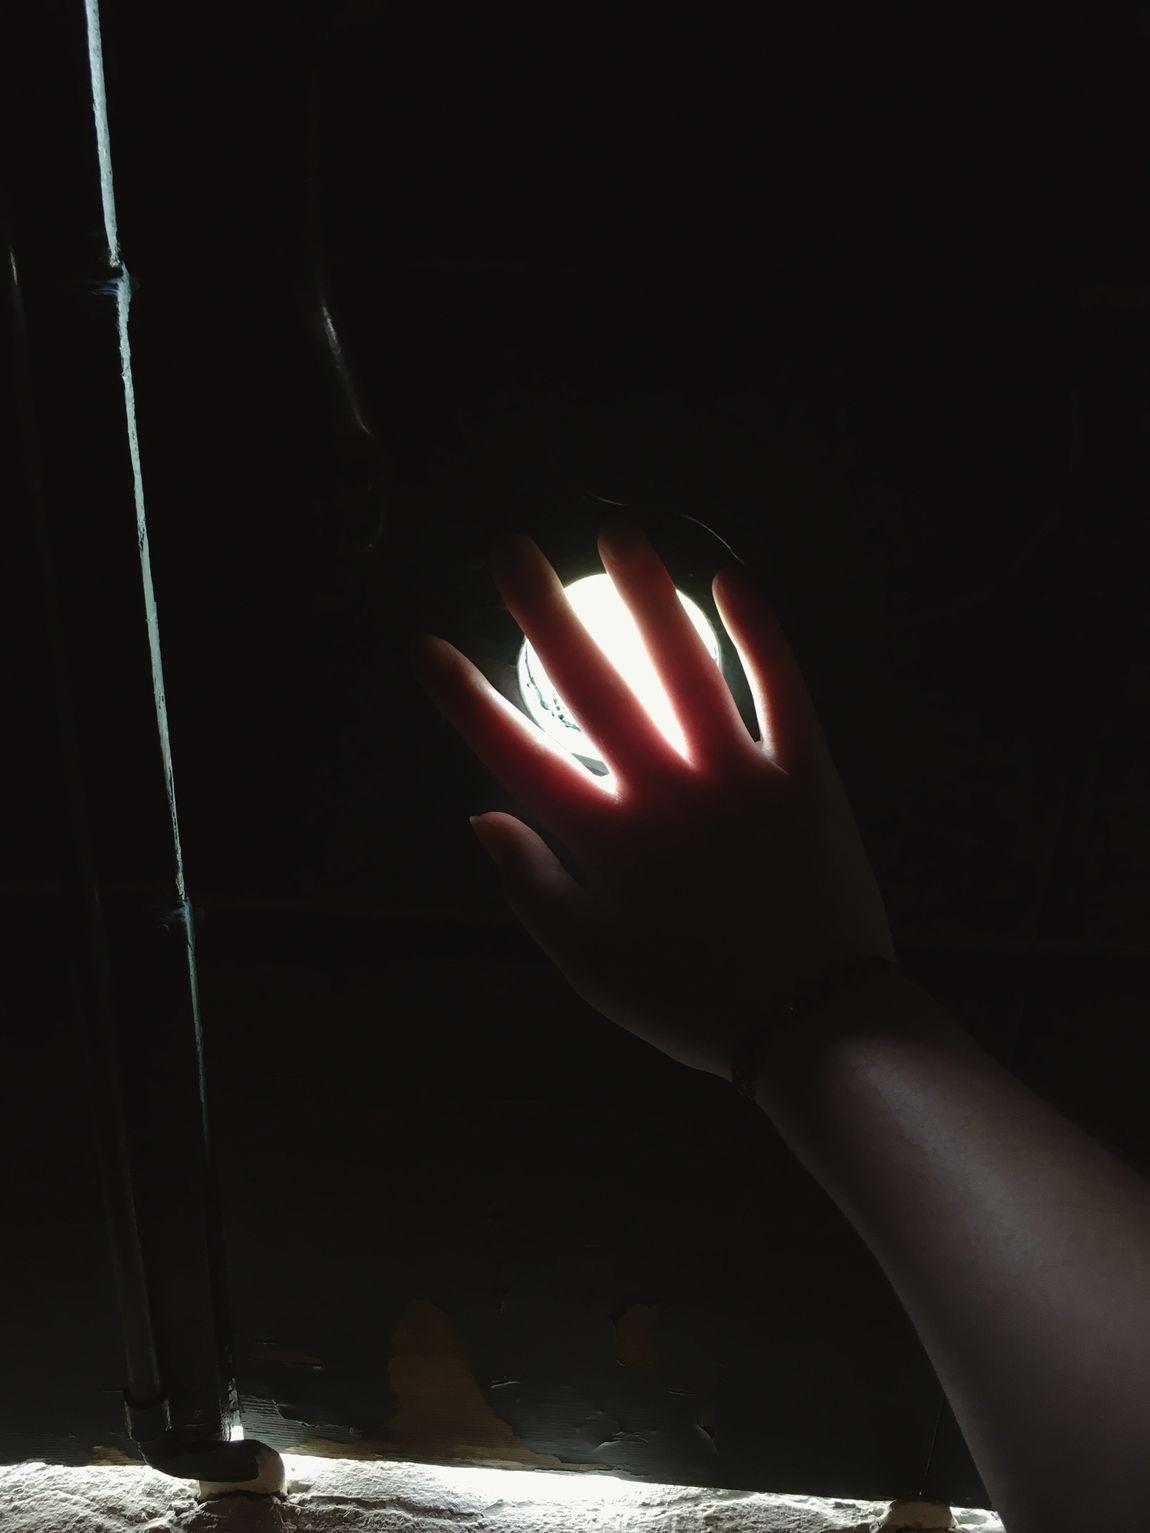 Human Hand One Person Window No Sense Night Light People Lifestyles Sweet Sleepy Awesome Crazy